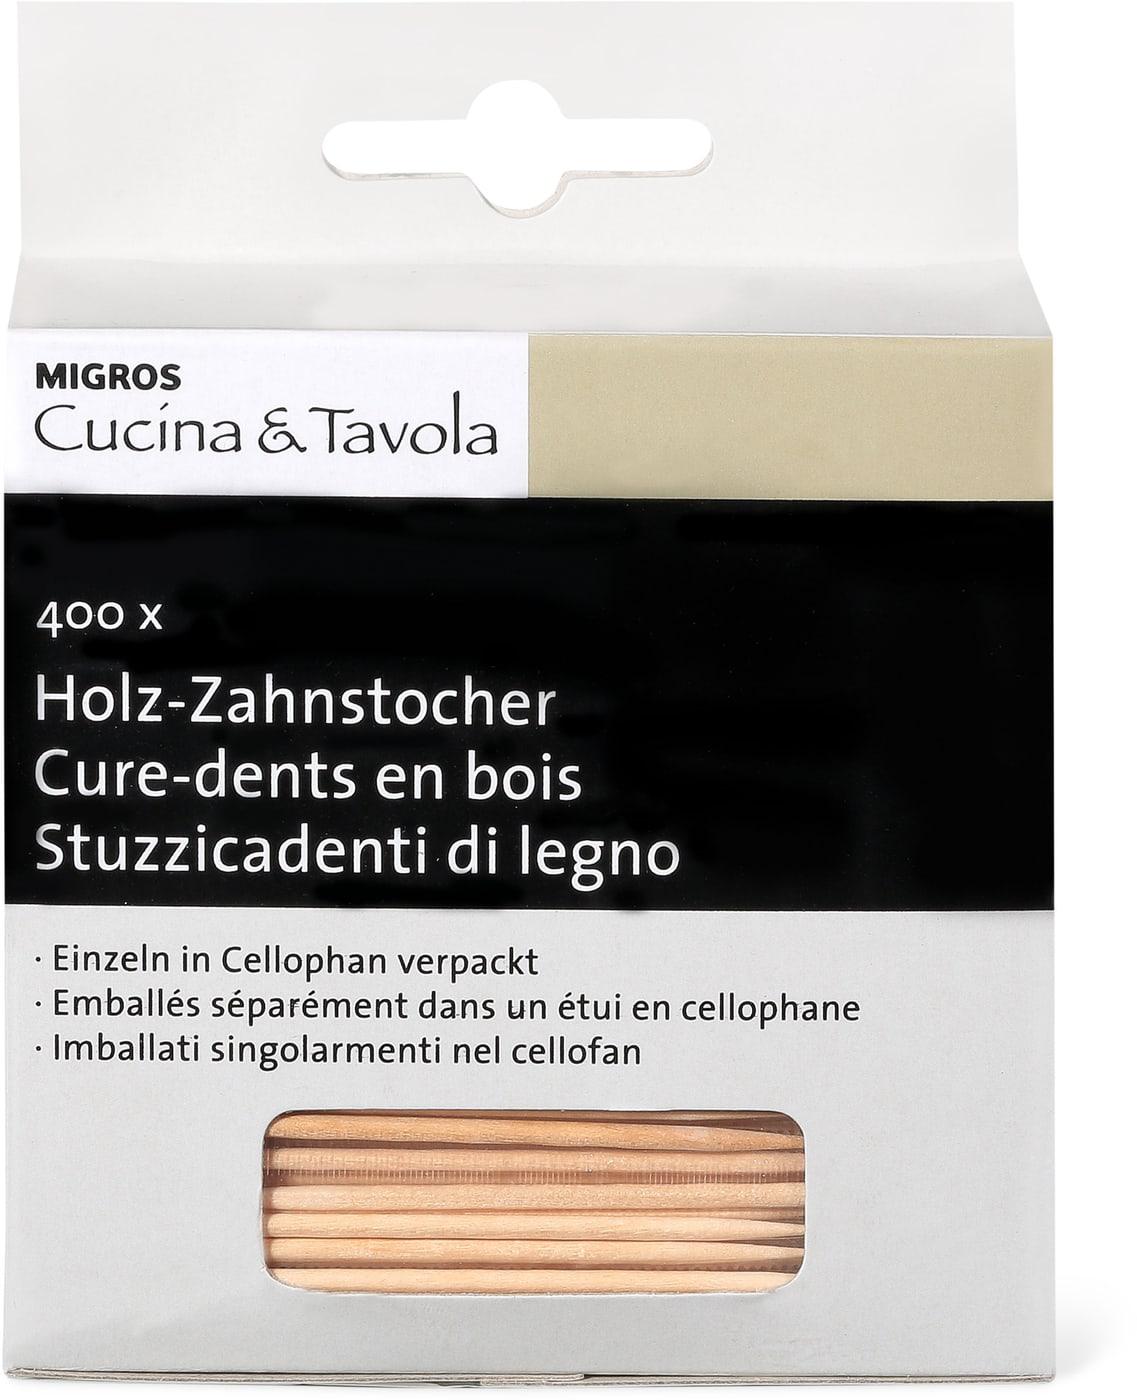 Holz zahnstocher cucina tavola migros for Cucina tavola